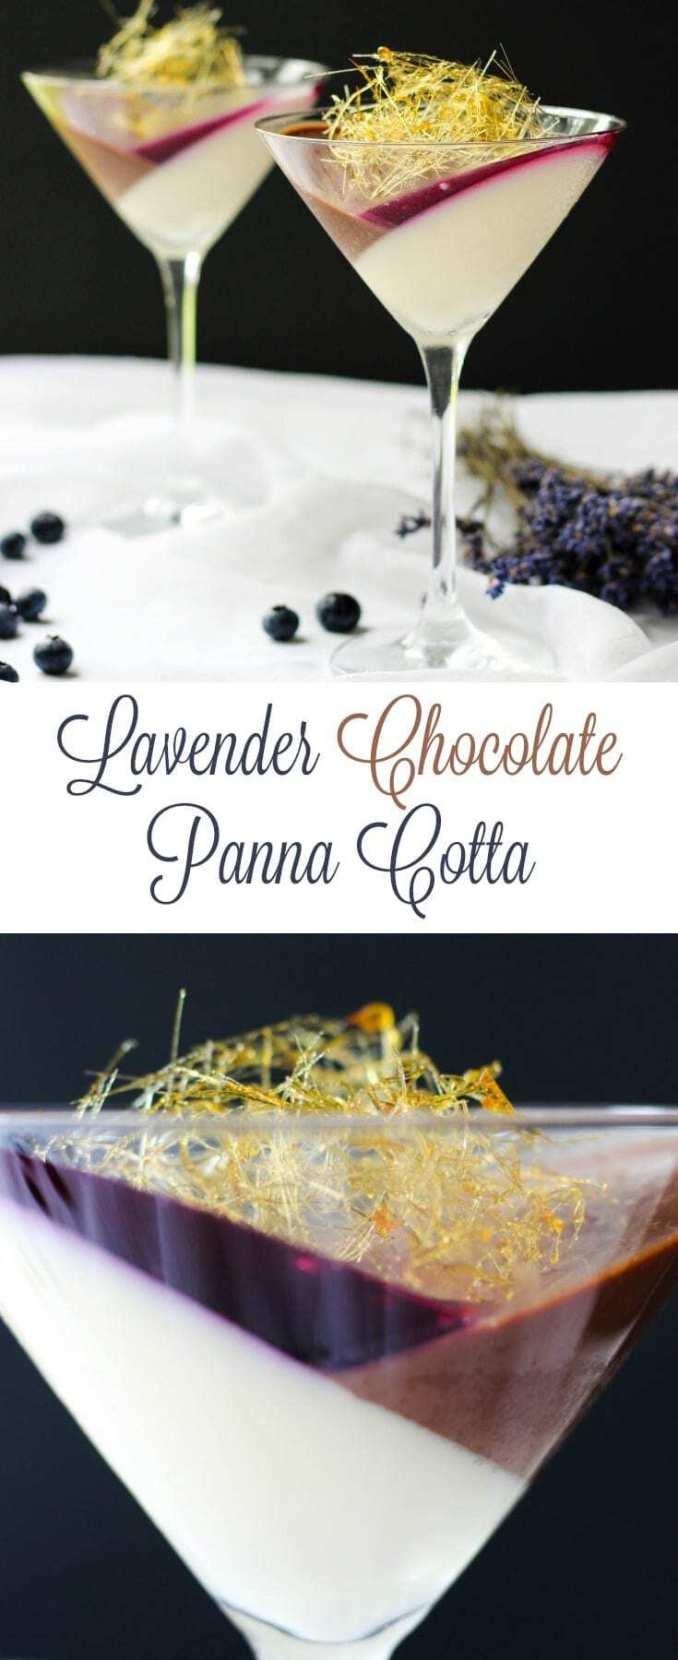 Lavender Chocolate Panna Cotta With Blueberry Jello